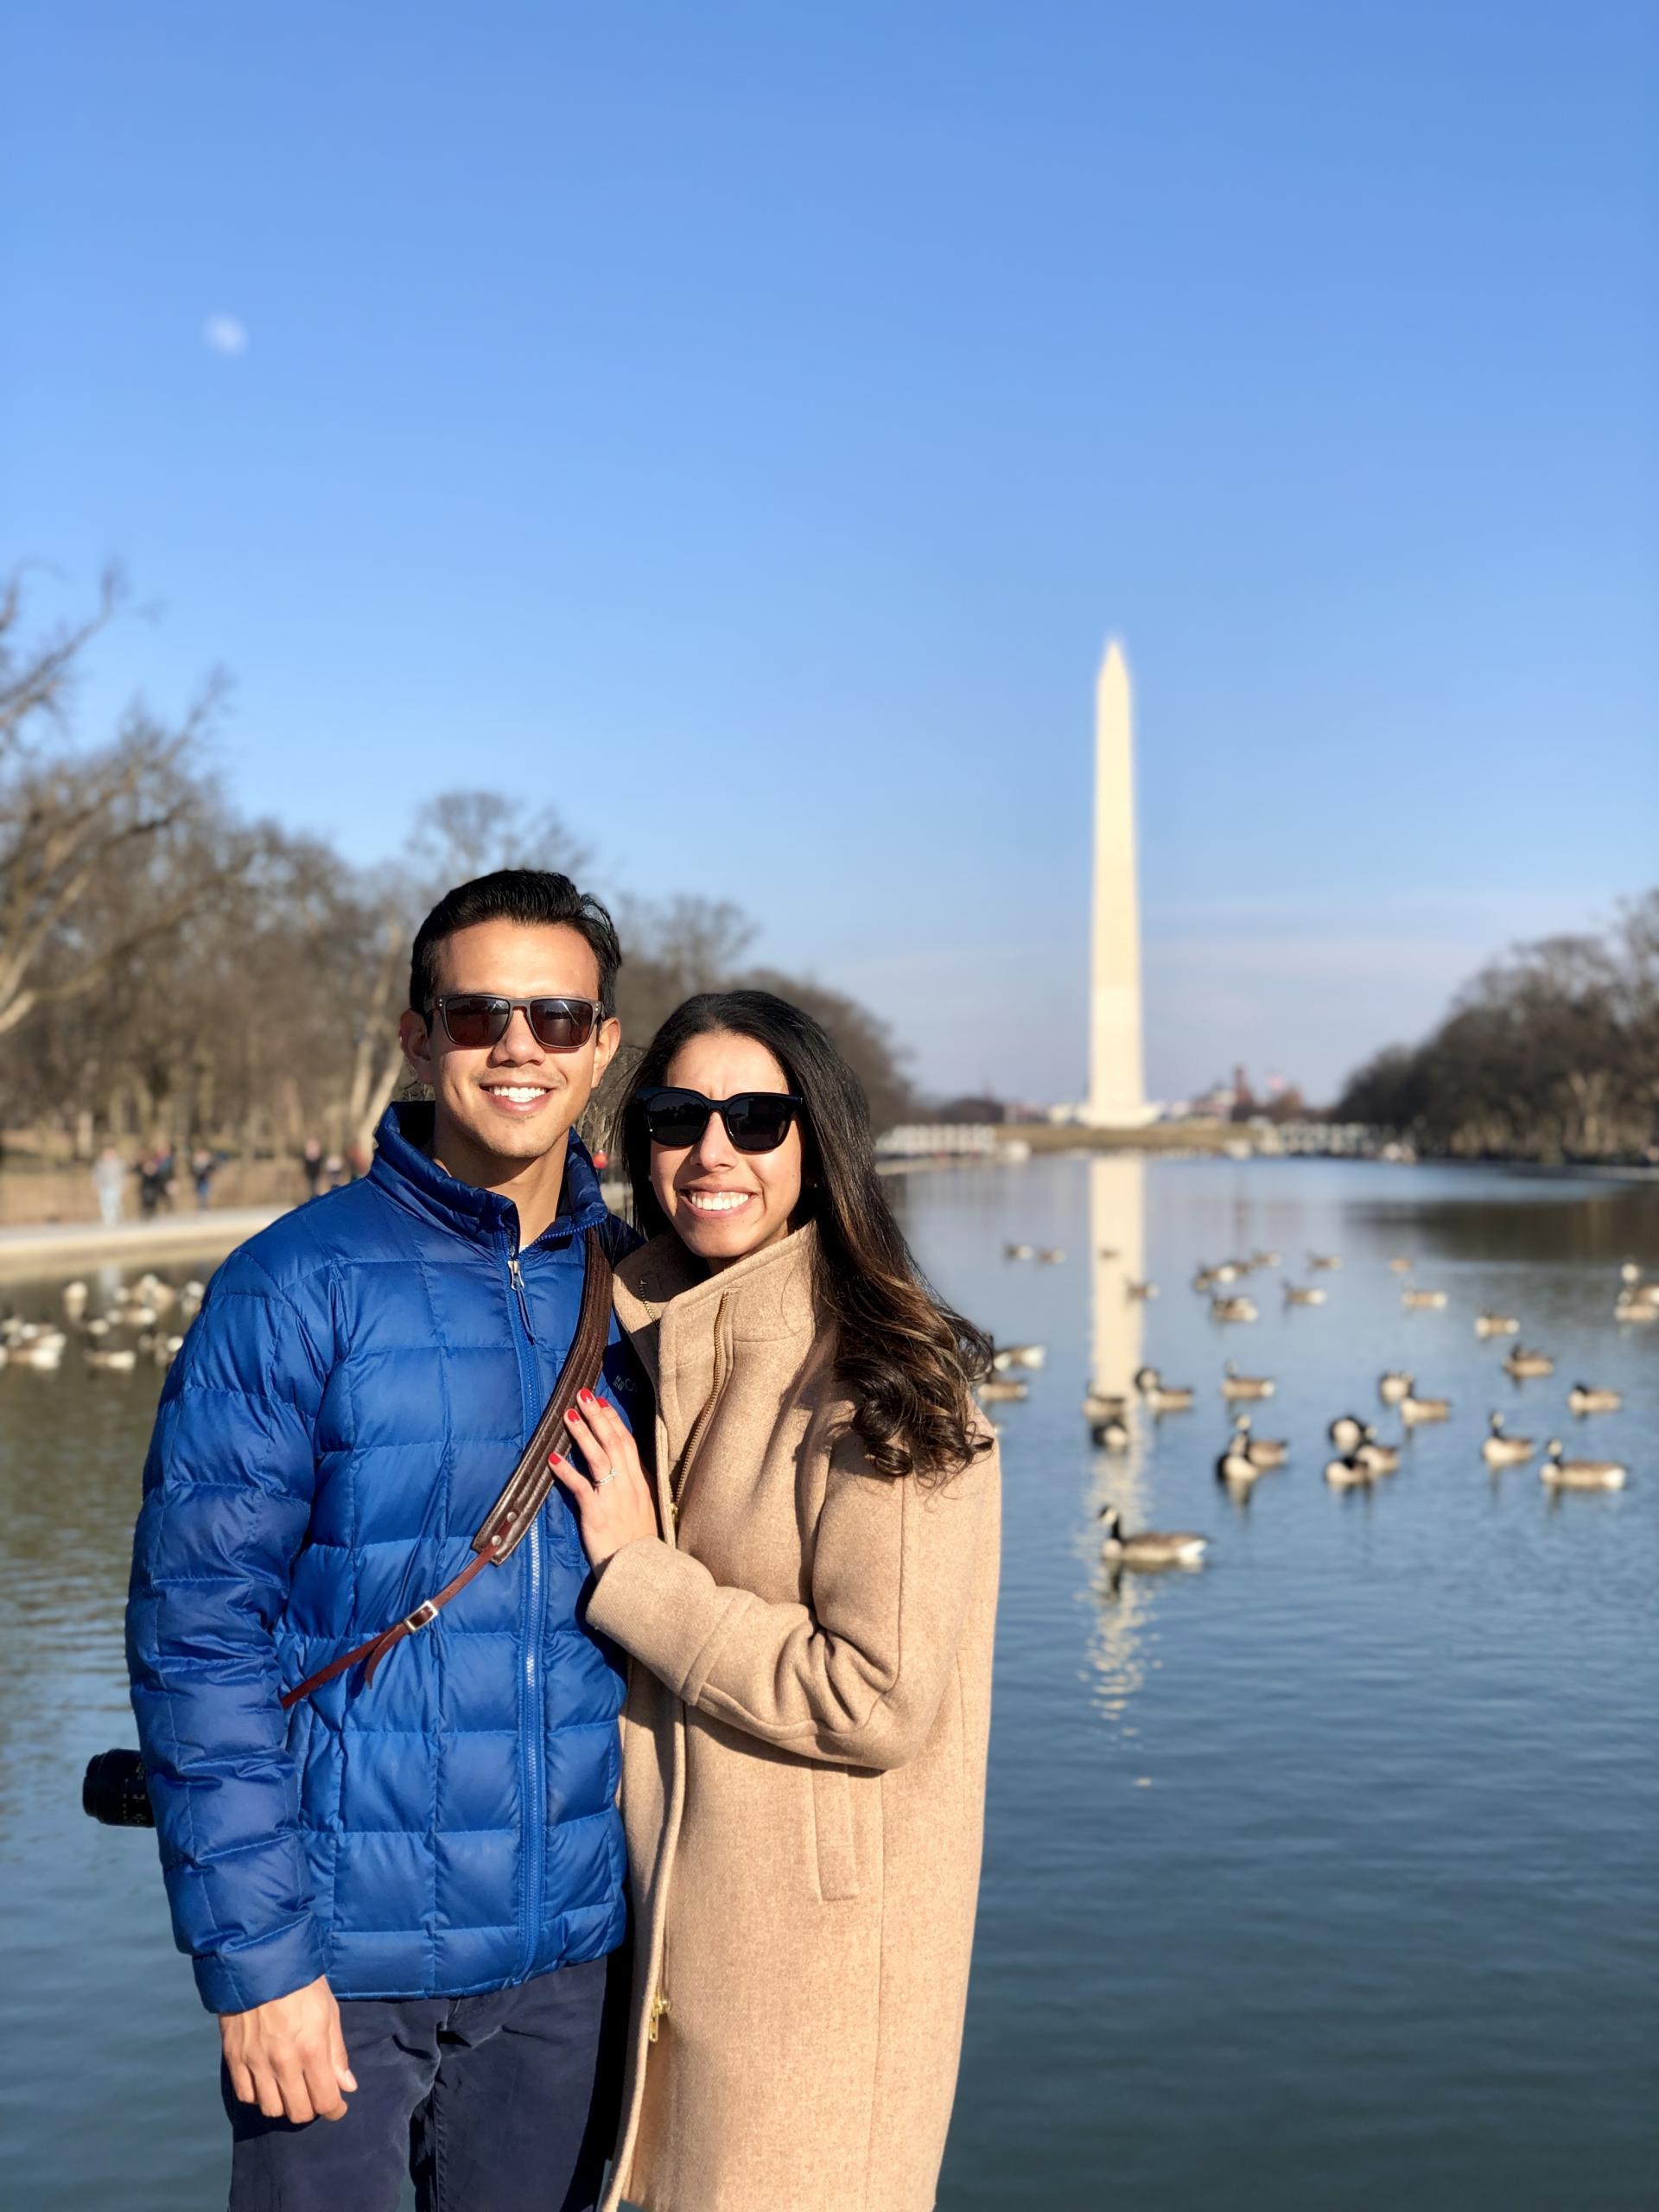 three days in Washington D.C.